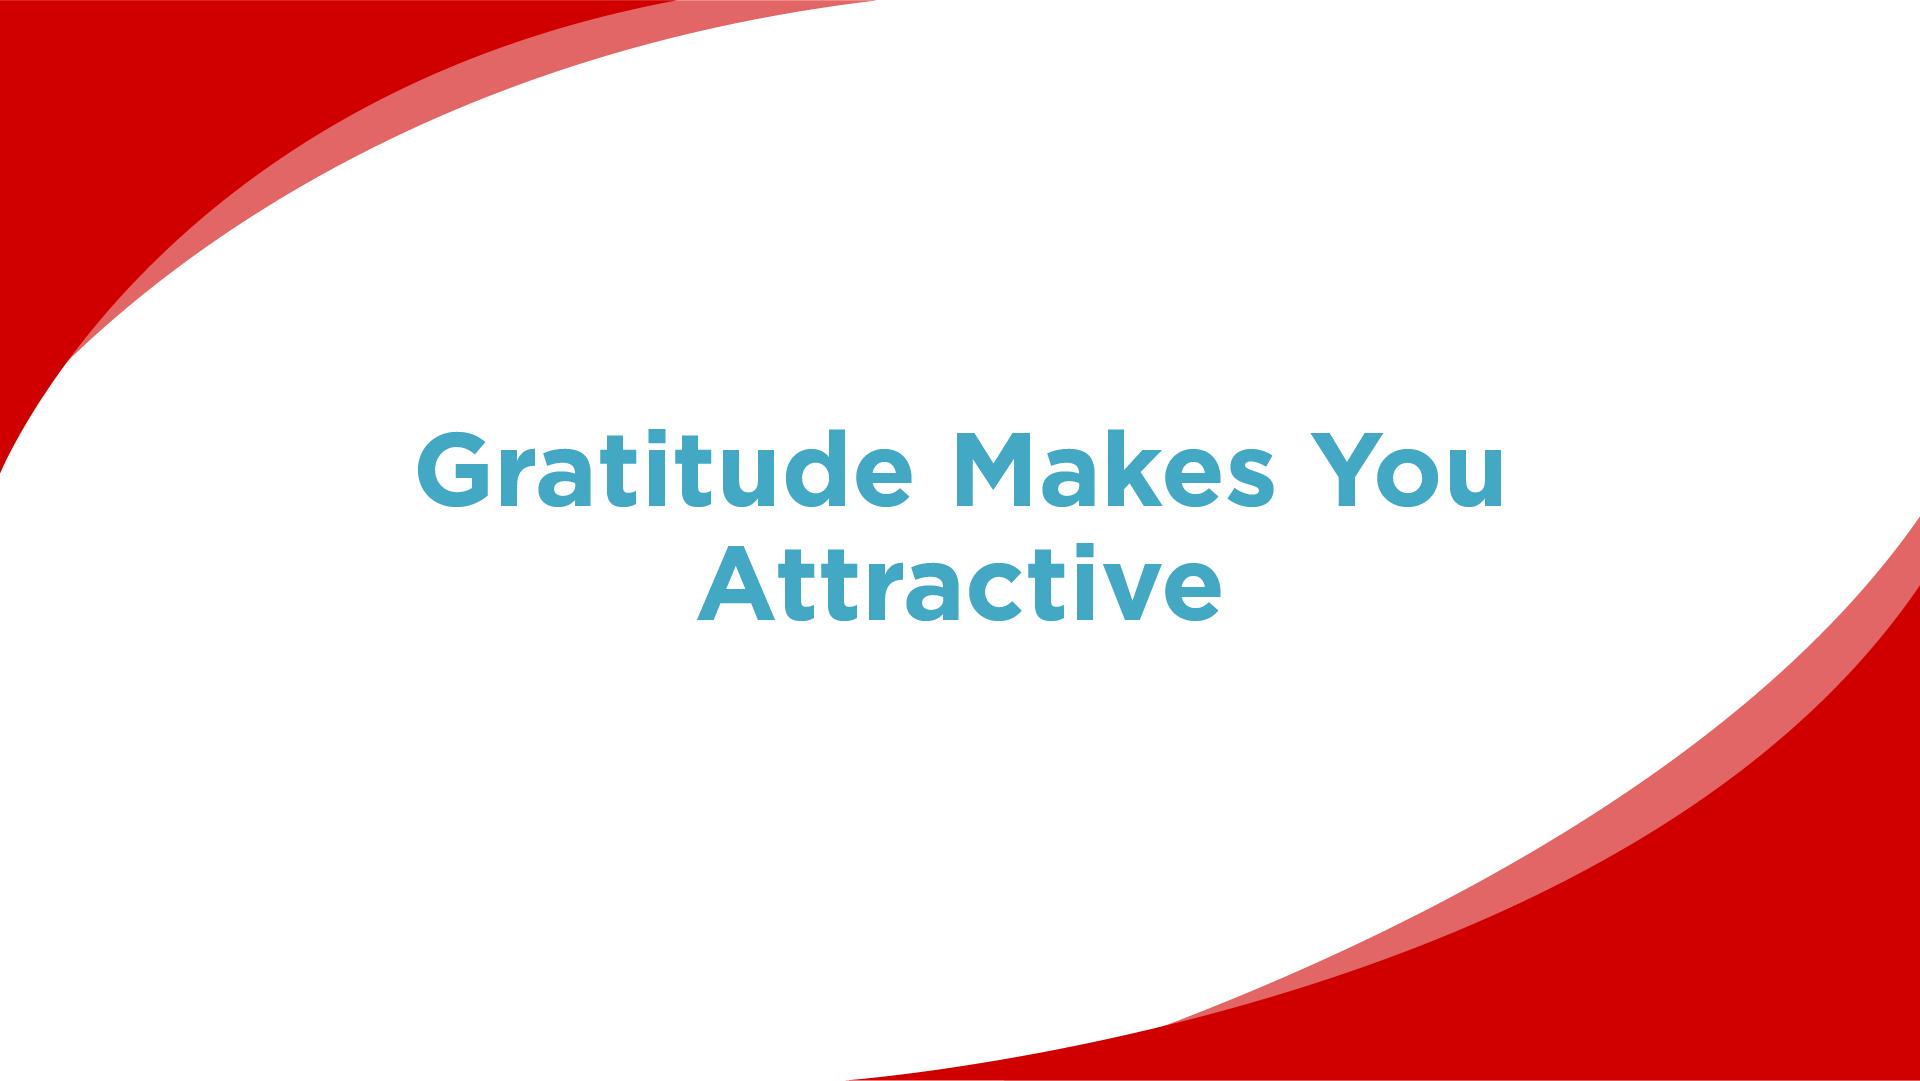 Gratitude Makes You Attractive